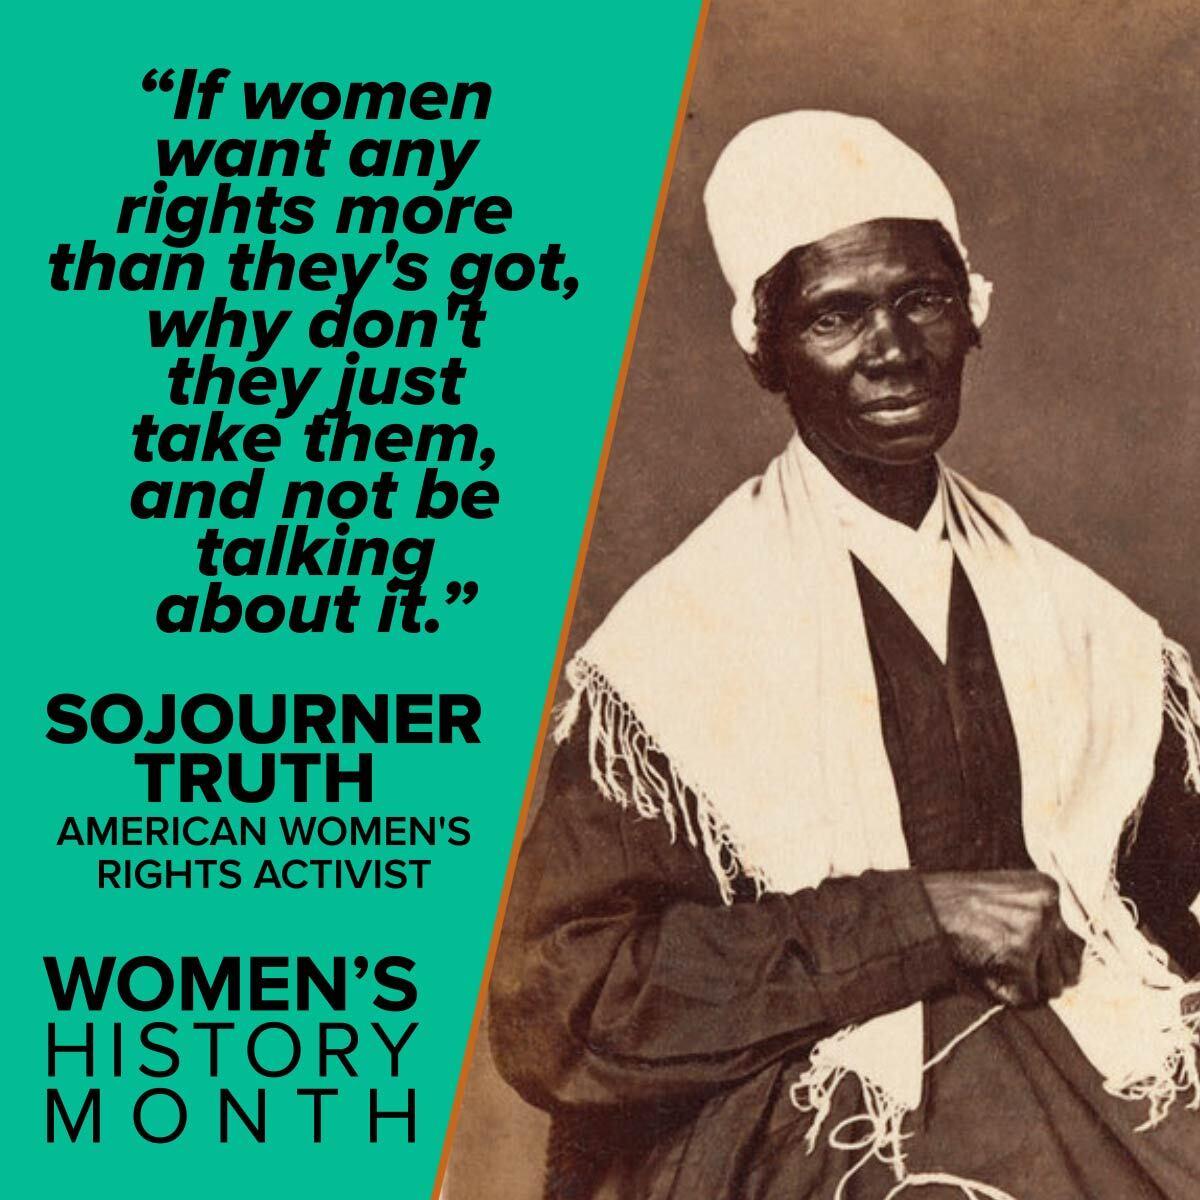 Women's History Month_Sojourner Truth.jpg